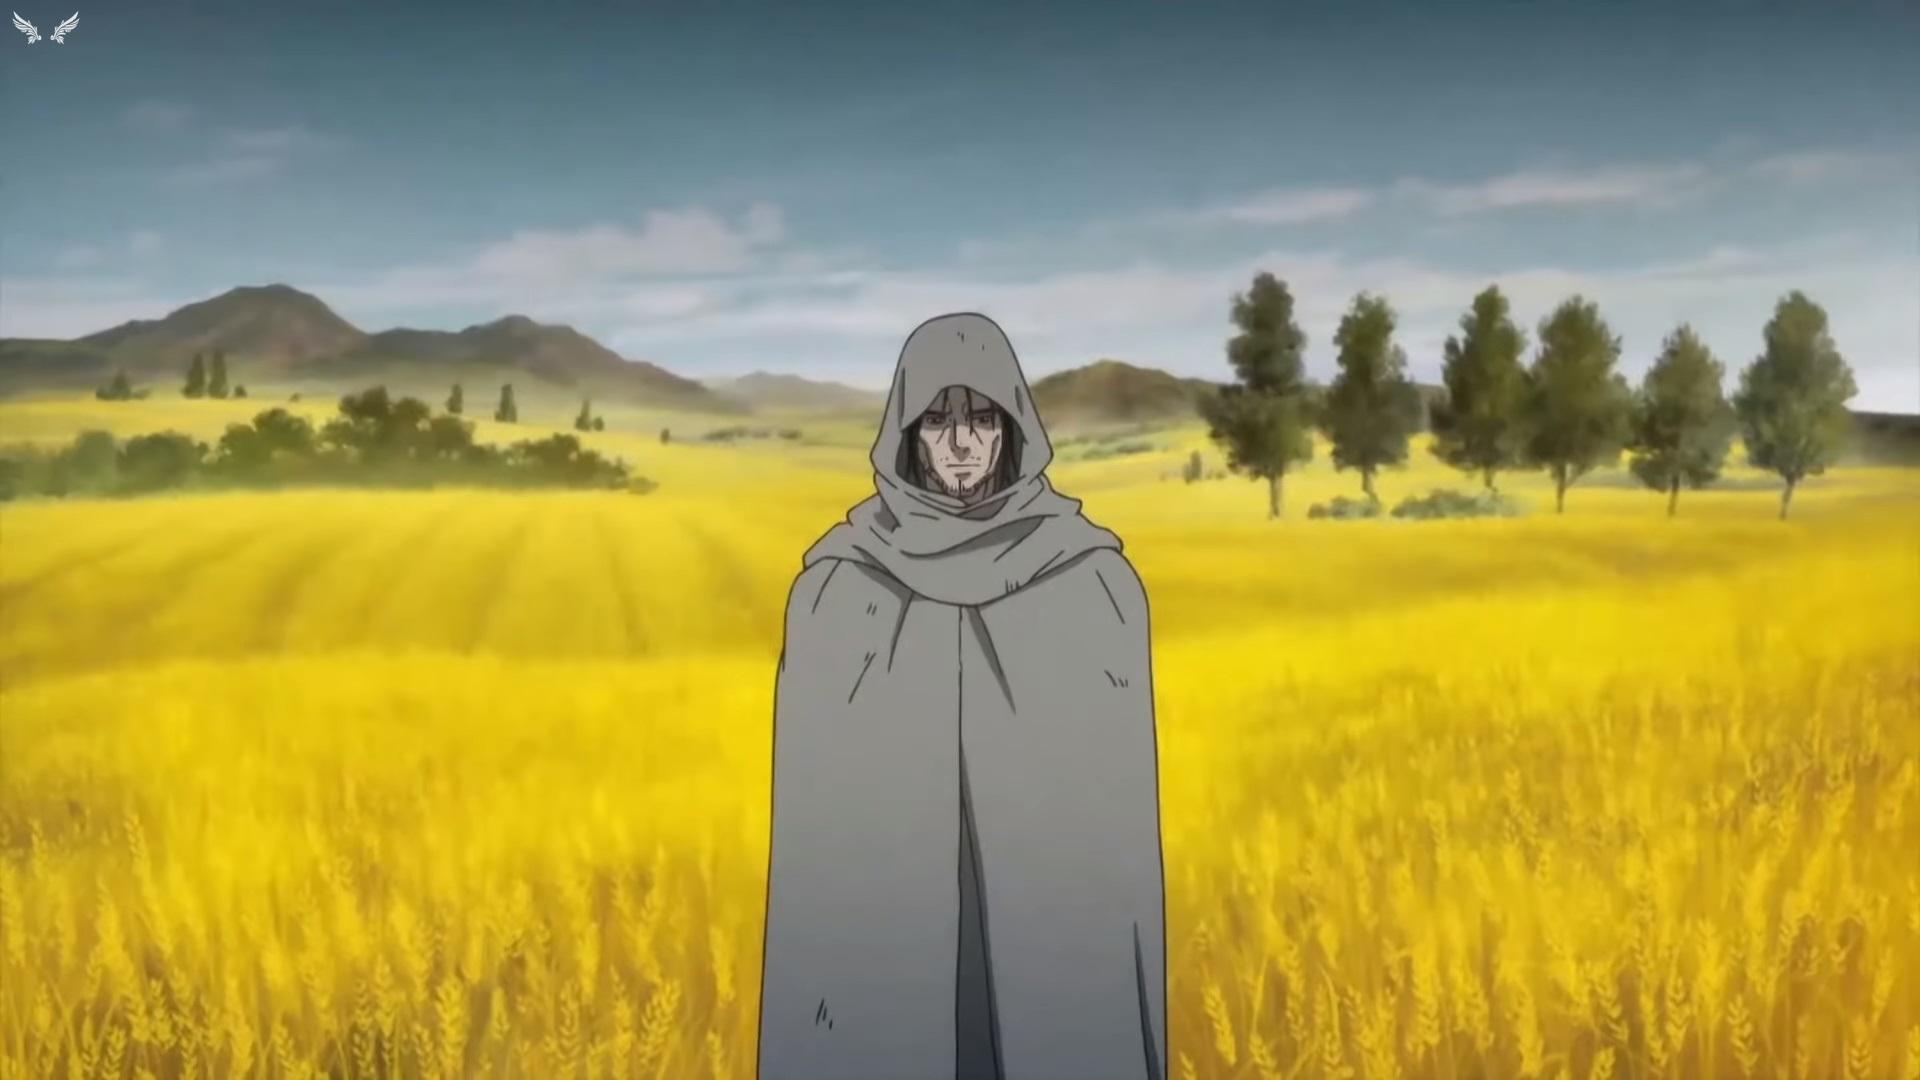 Domande e risposte sull'anime FFXV Episode Ardyn: Prologue!